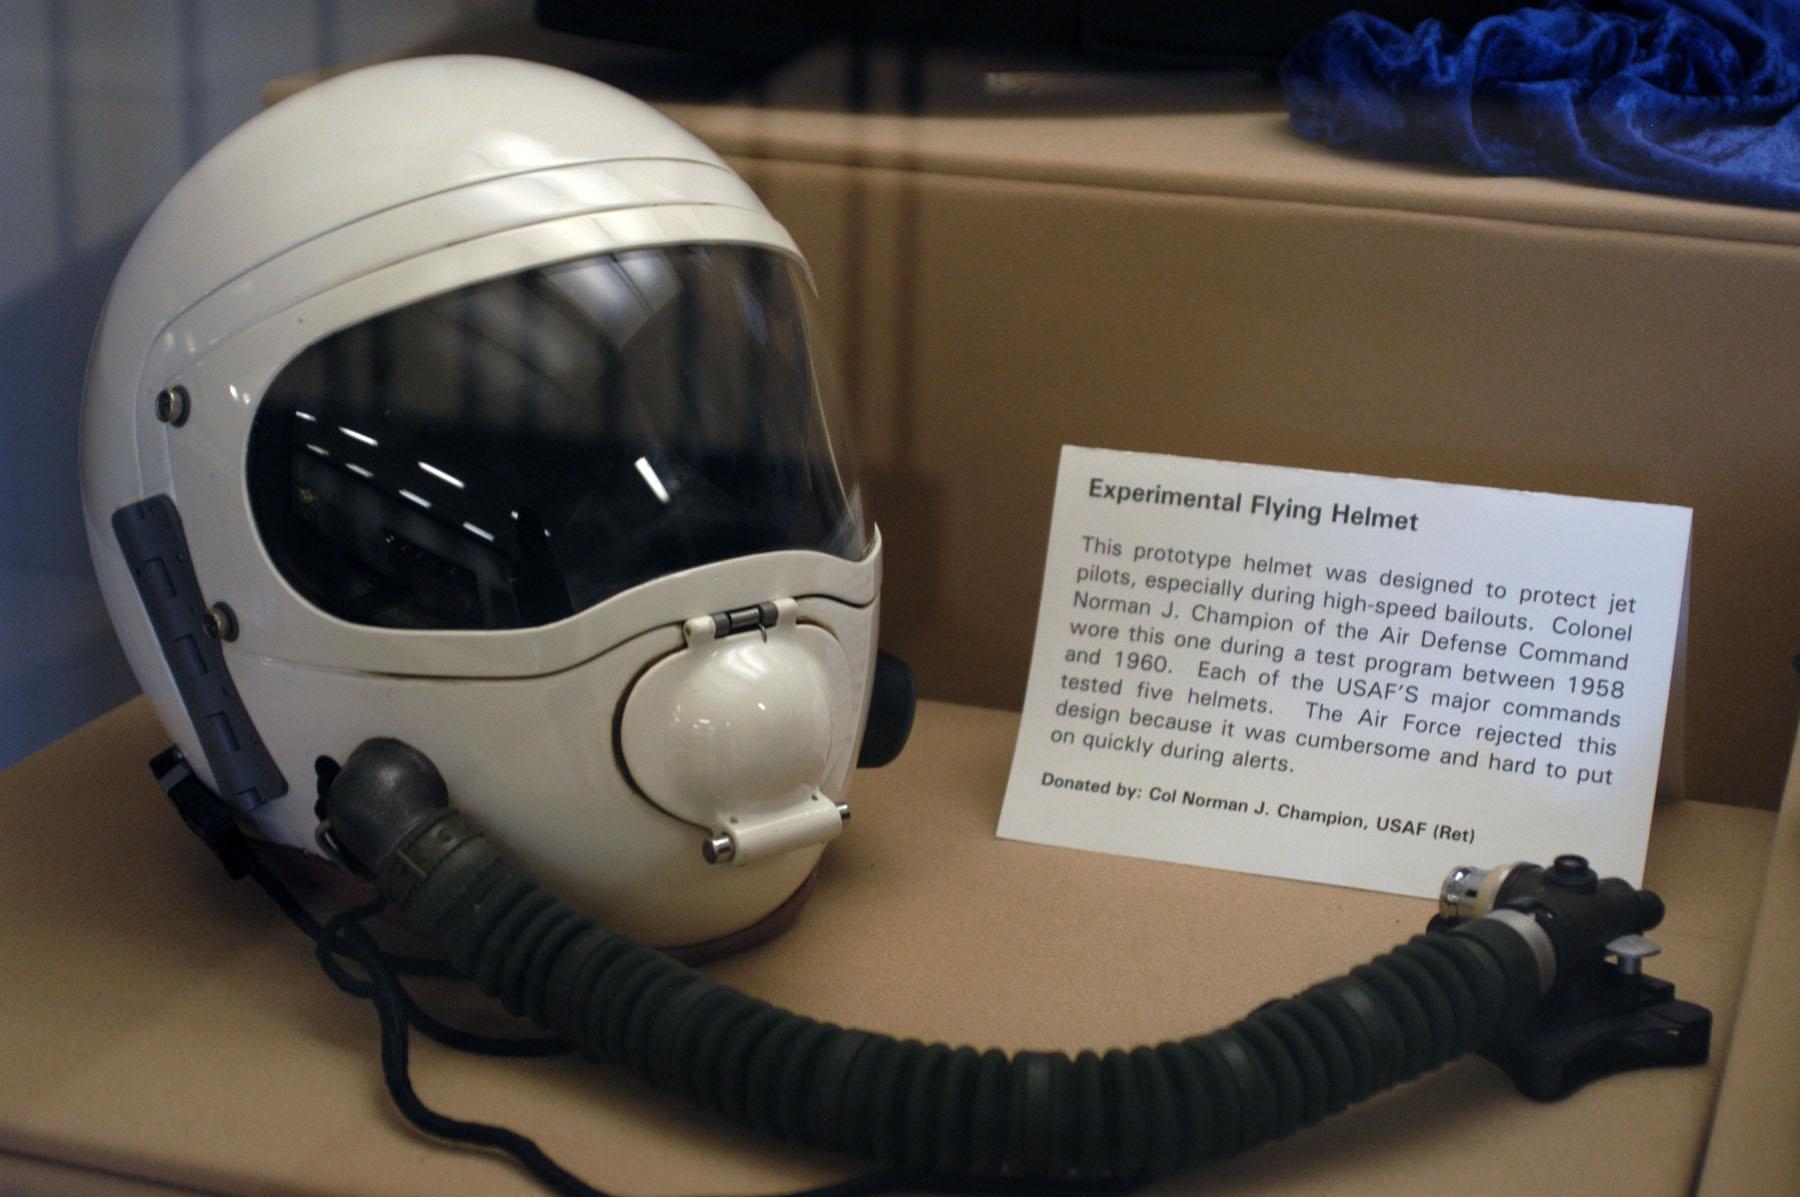 Experimental Flying Helmet Gt National Museum Of The Us Air